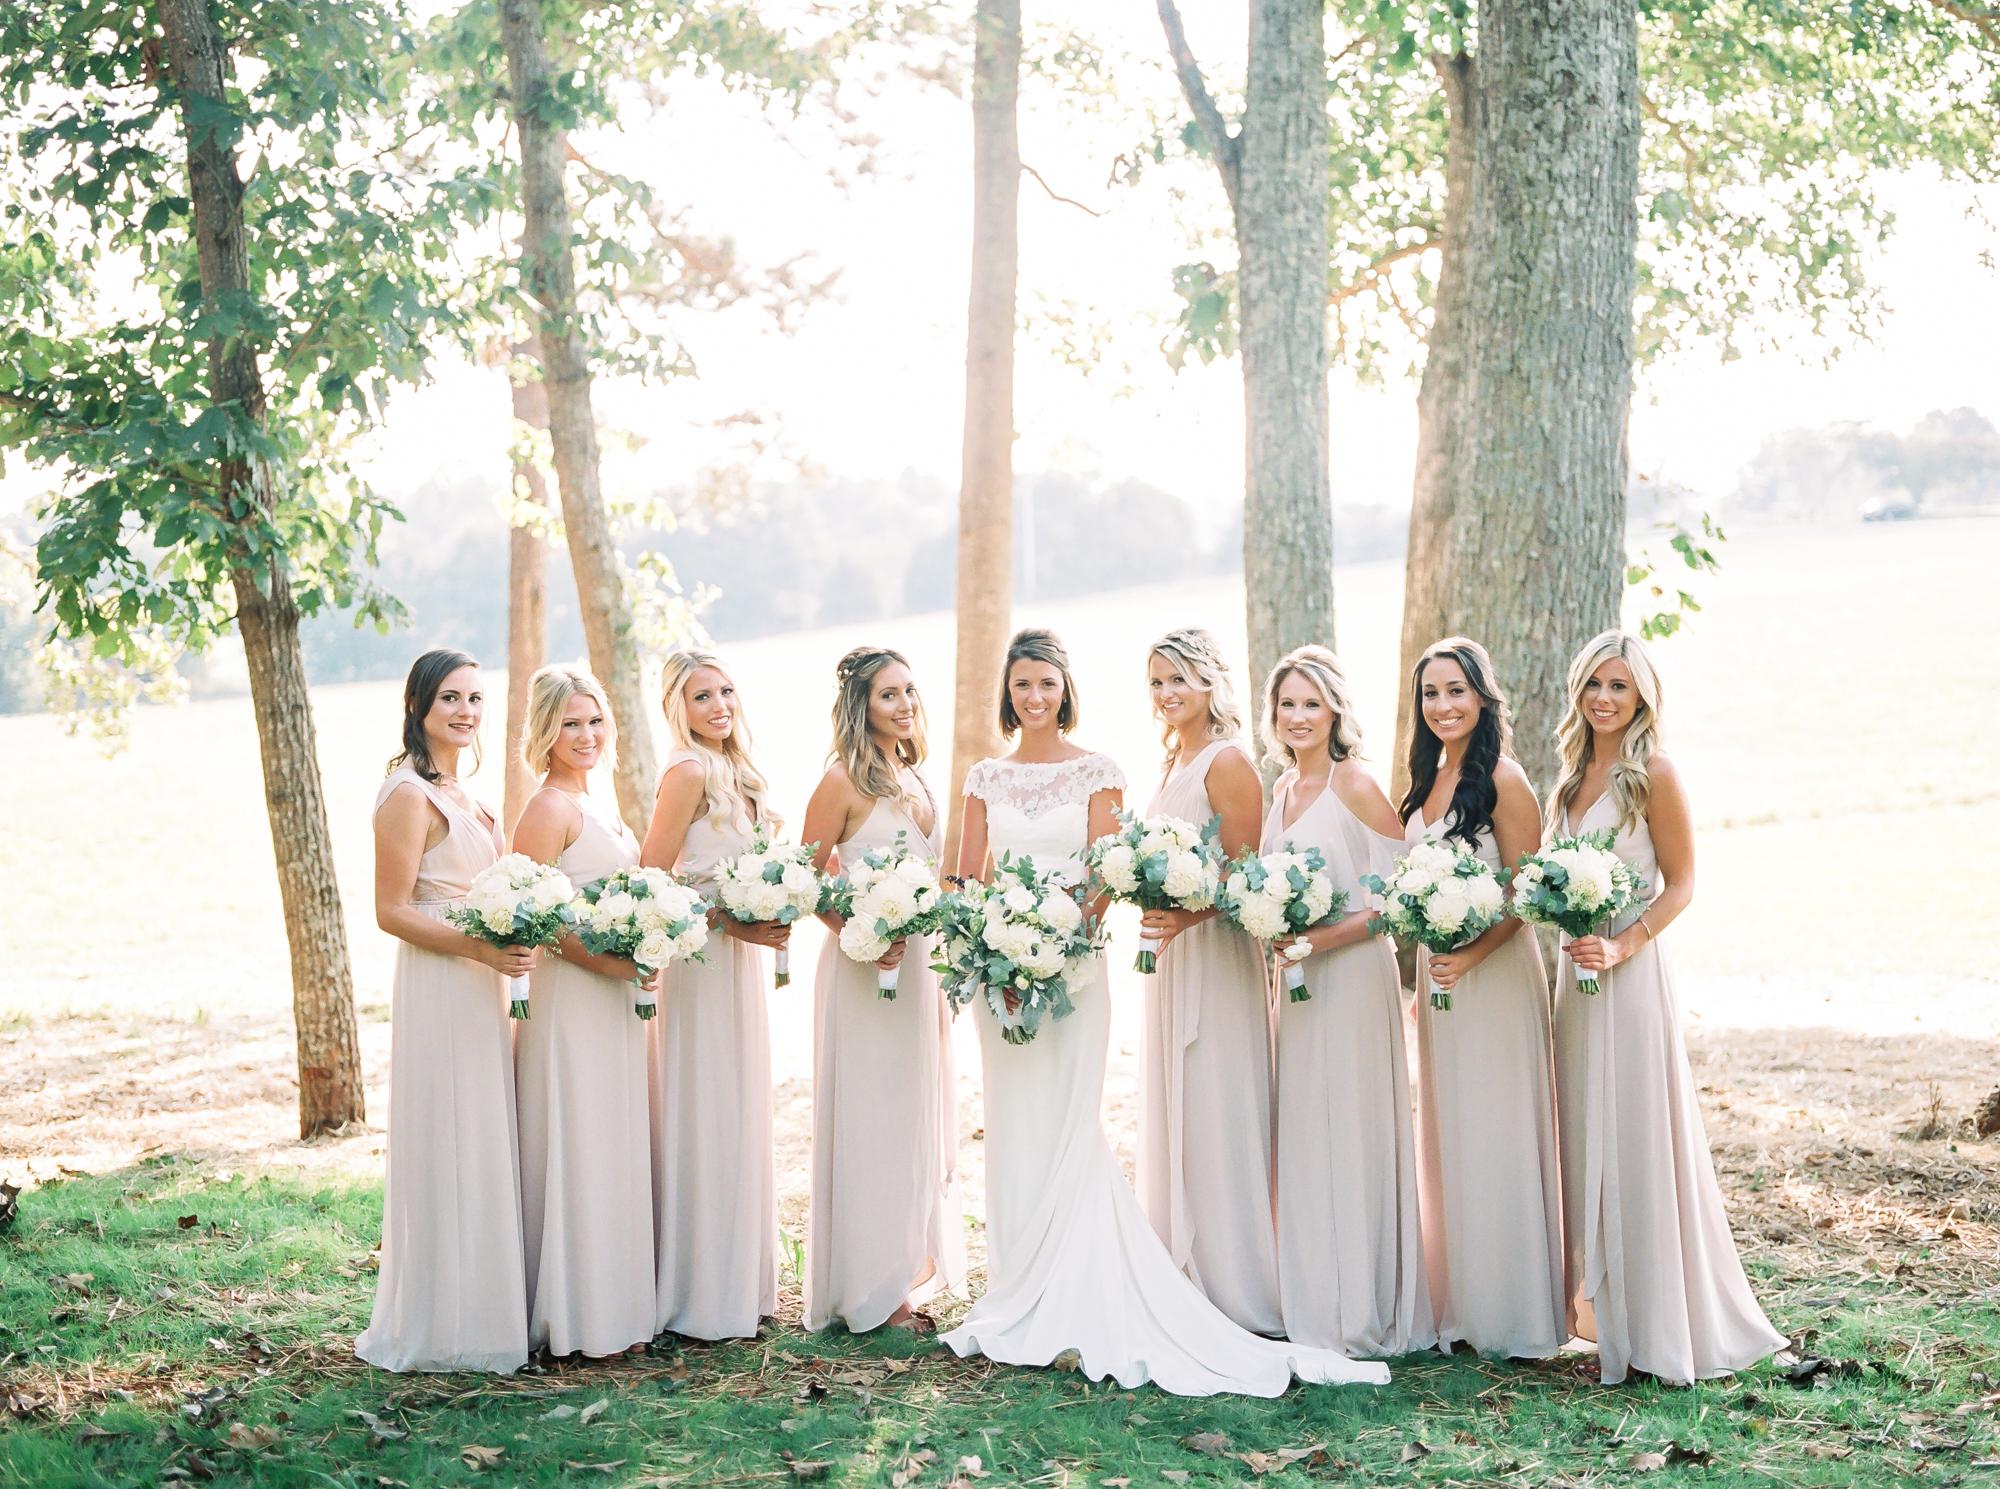 bride with bridesmaids in farmhouse wedding